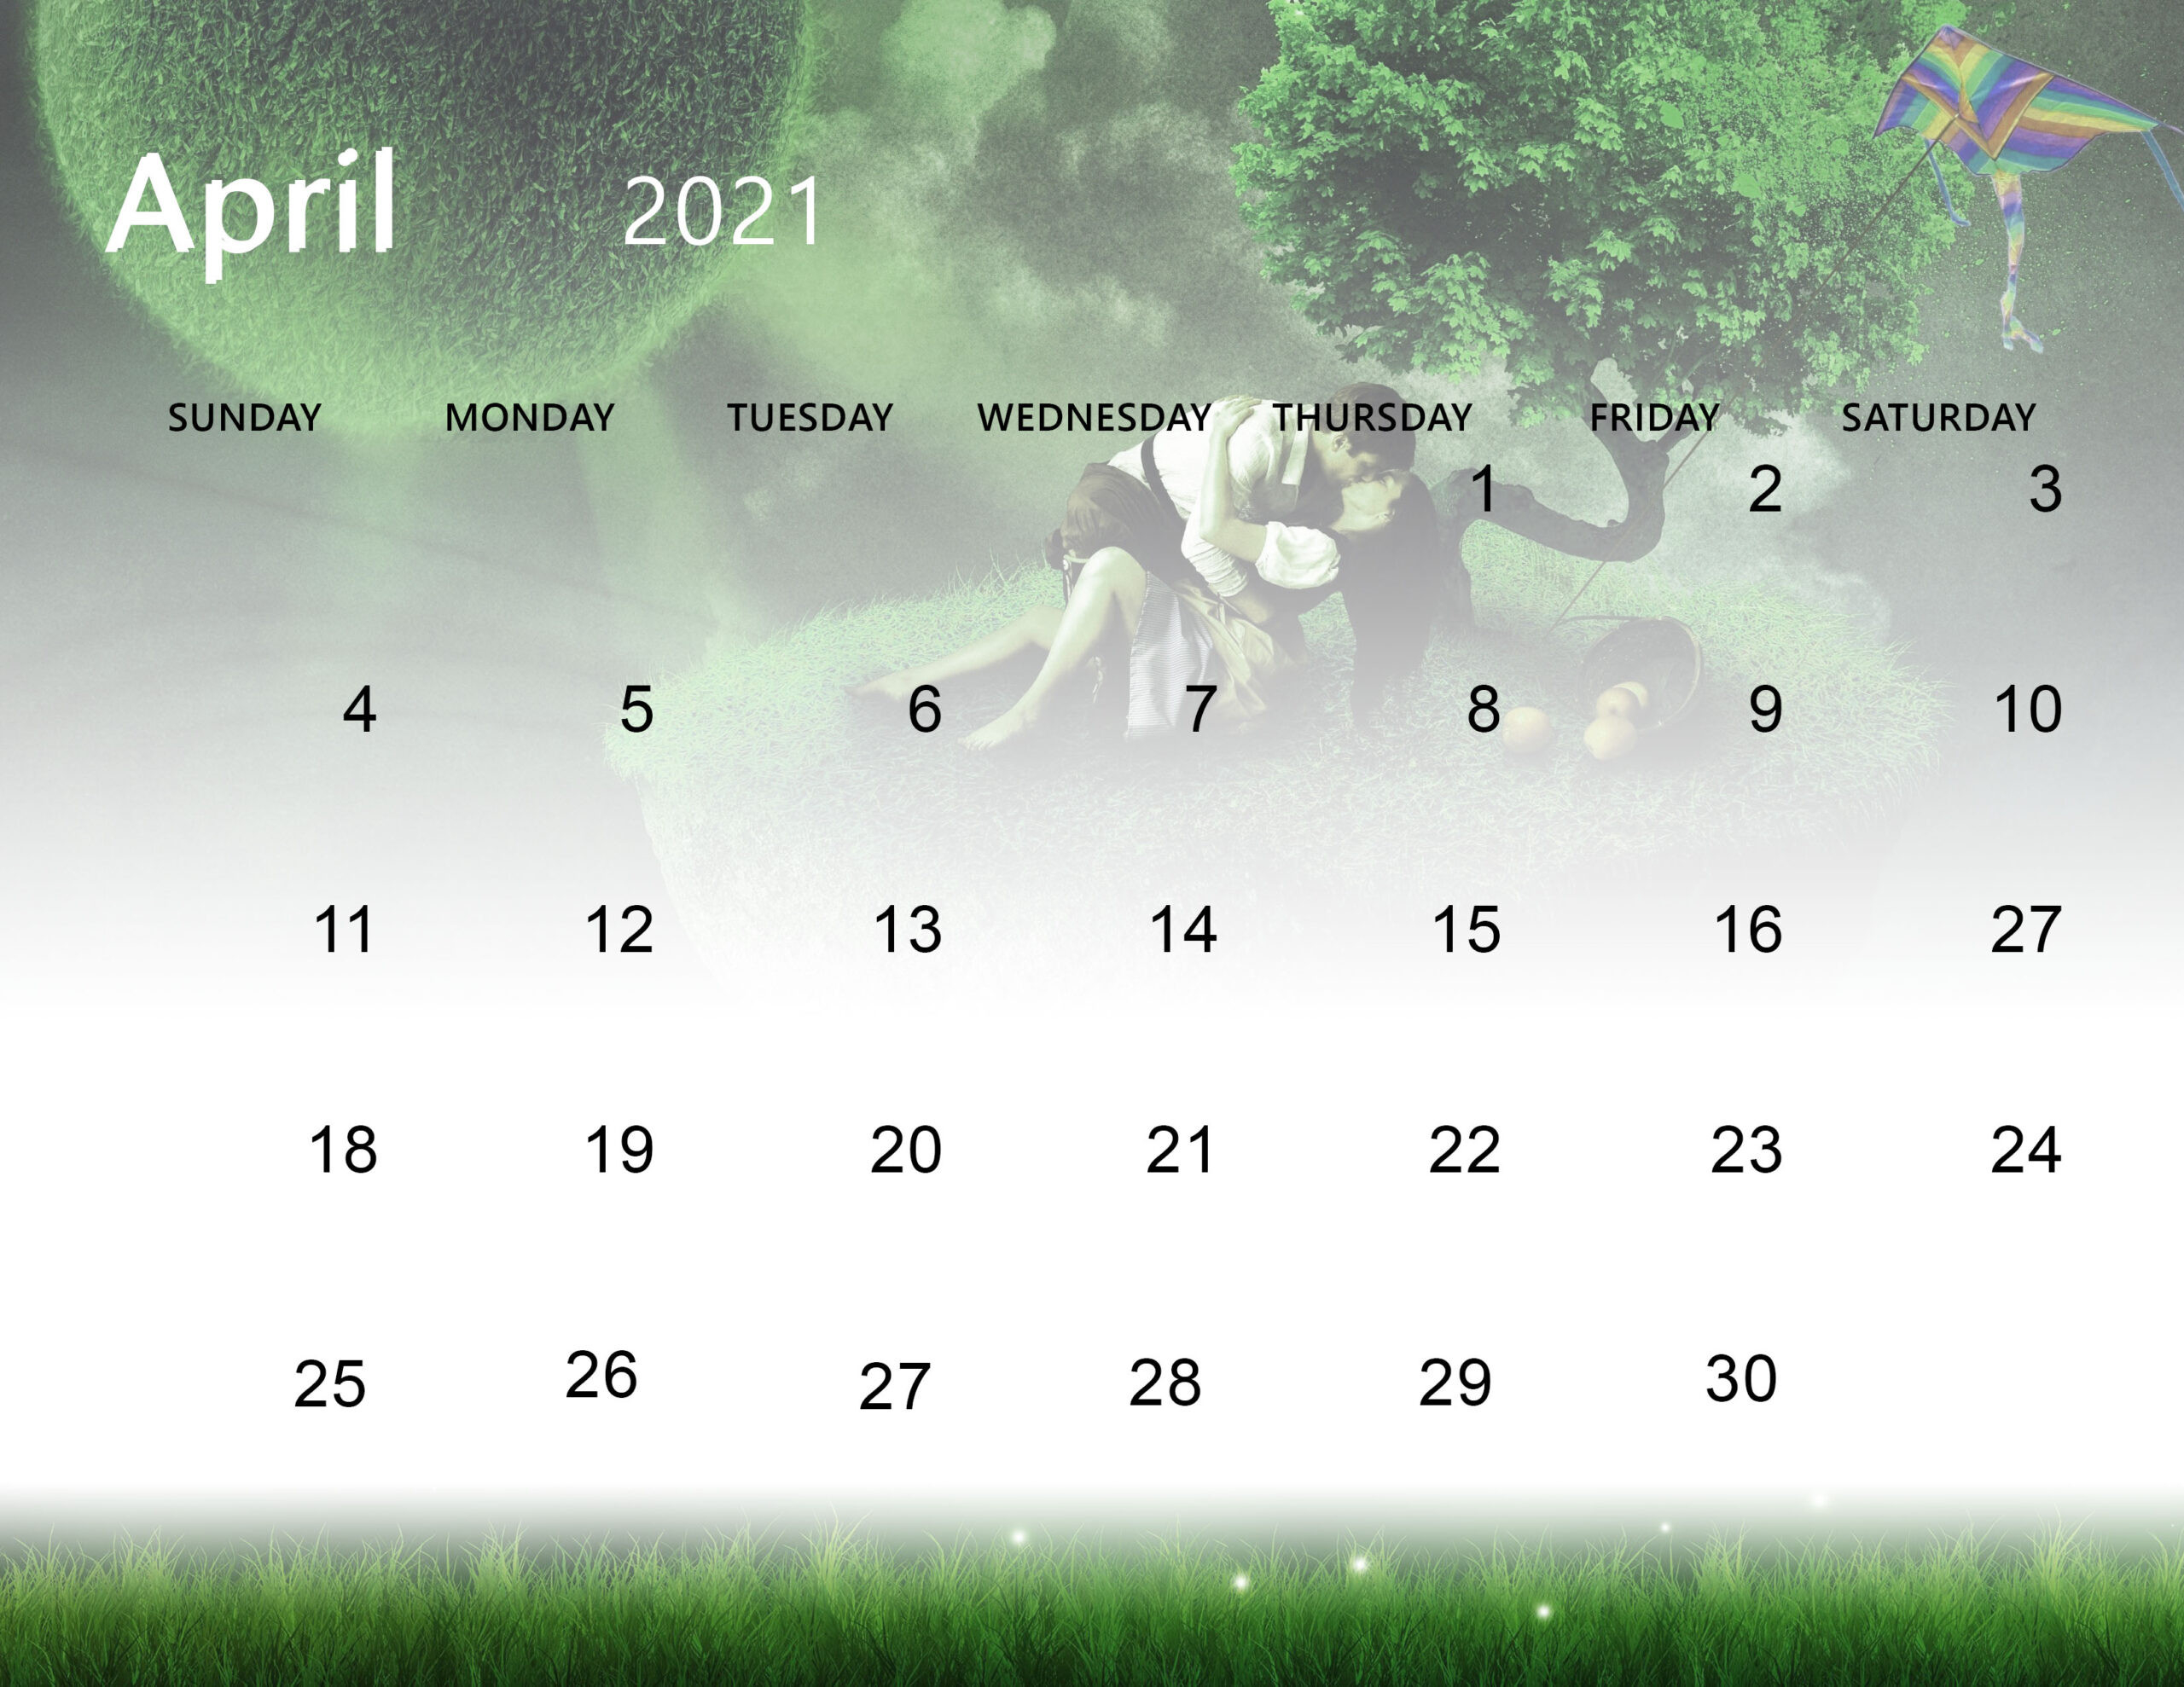 Cute April 2021 Calendar Desktop Wallpaper - Thecalendarpedia-Monthly Calendar 2021 For Wallpaper